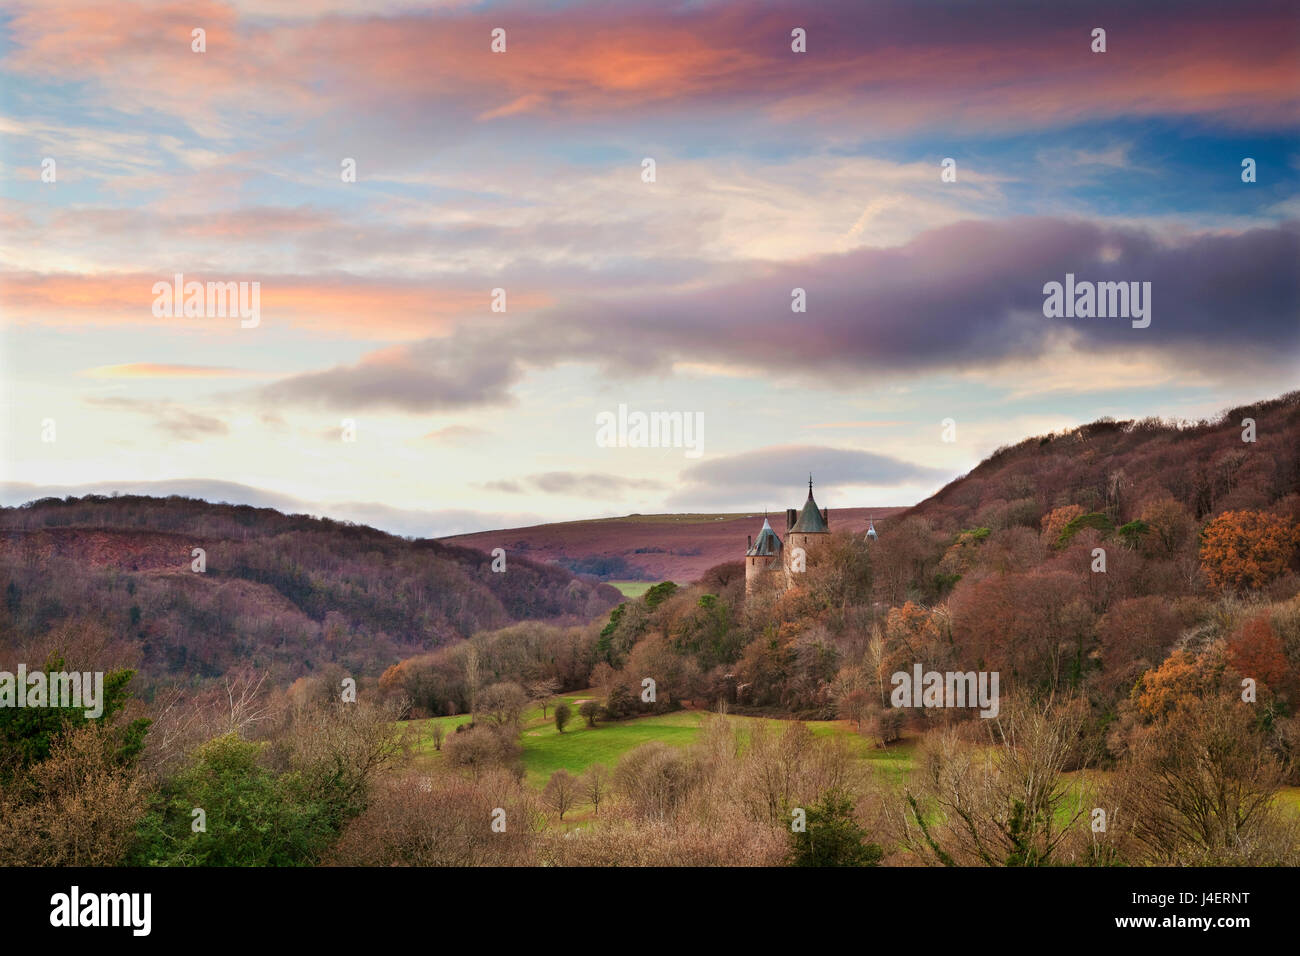 Castle Coch (Castell Coch) (Le Château Rouge), Tongwynlais, Cardiff, Pays de Galles, Royaume-Uni, Europe Photo Stock